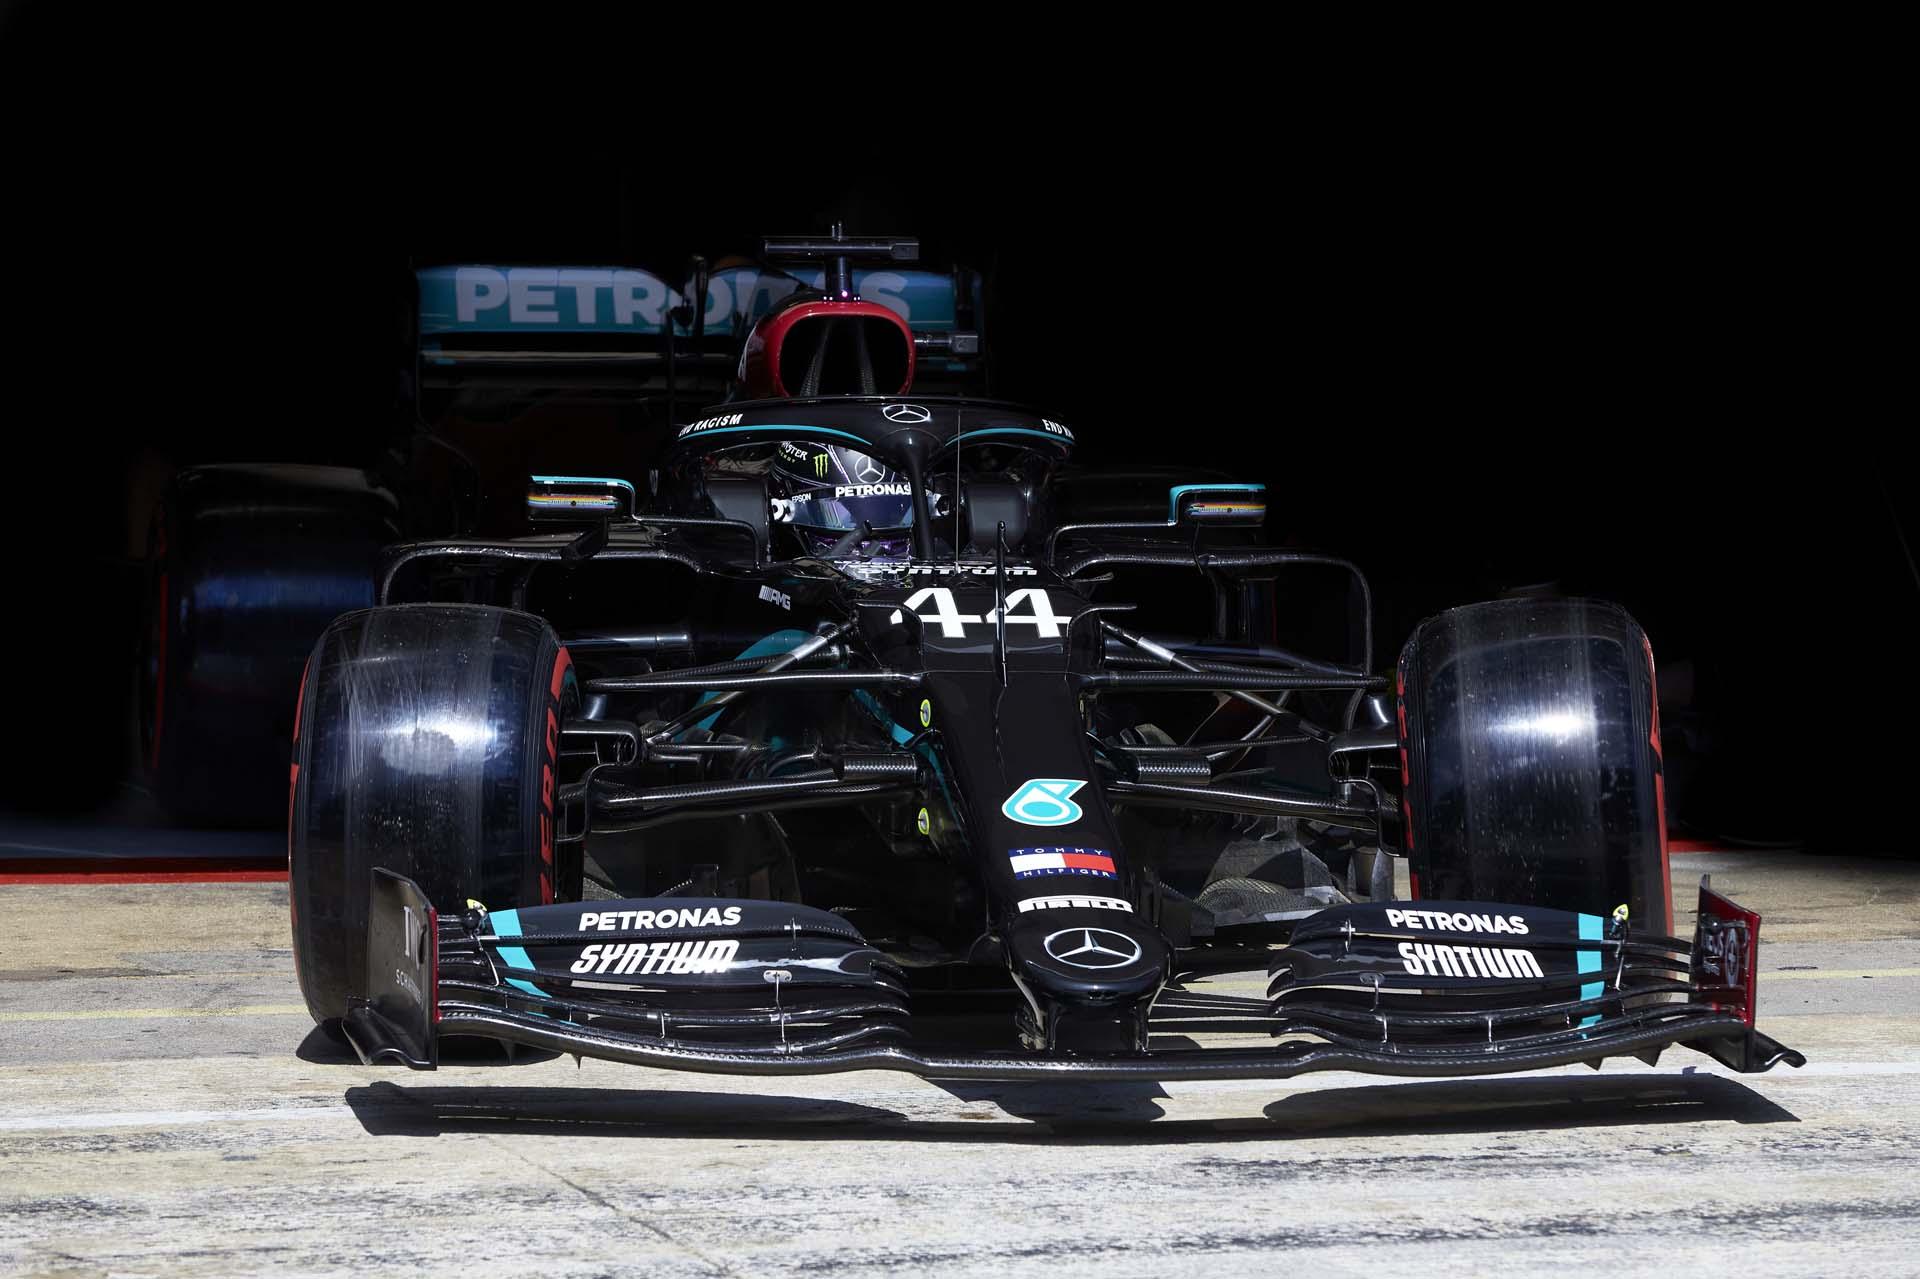 2020 Spanish Grand Prix, Saturday - Steve Etherington